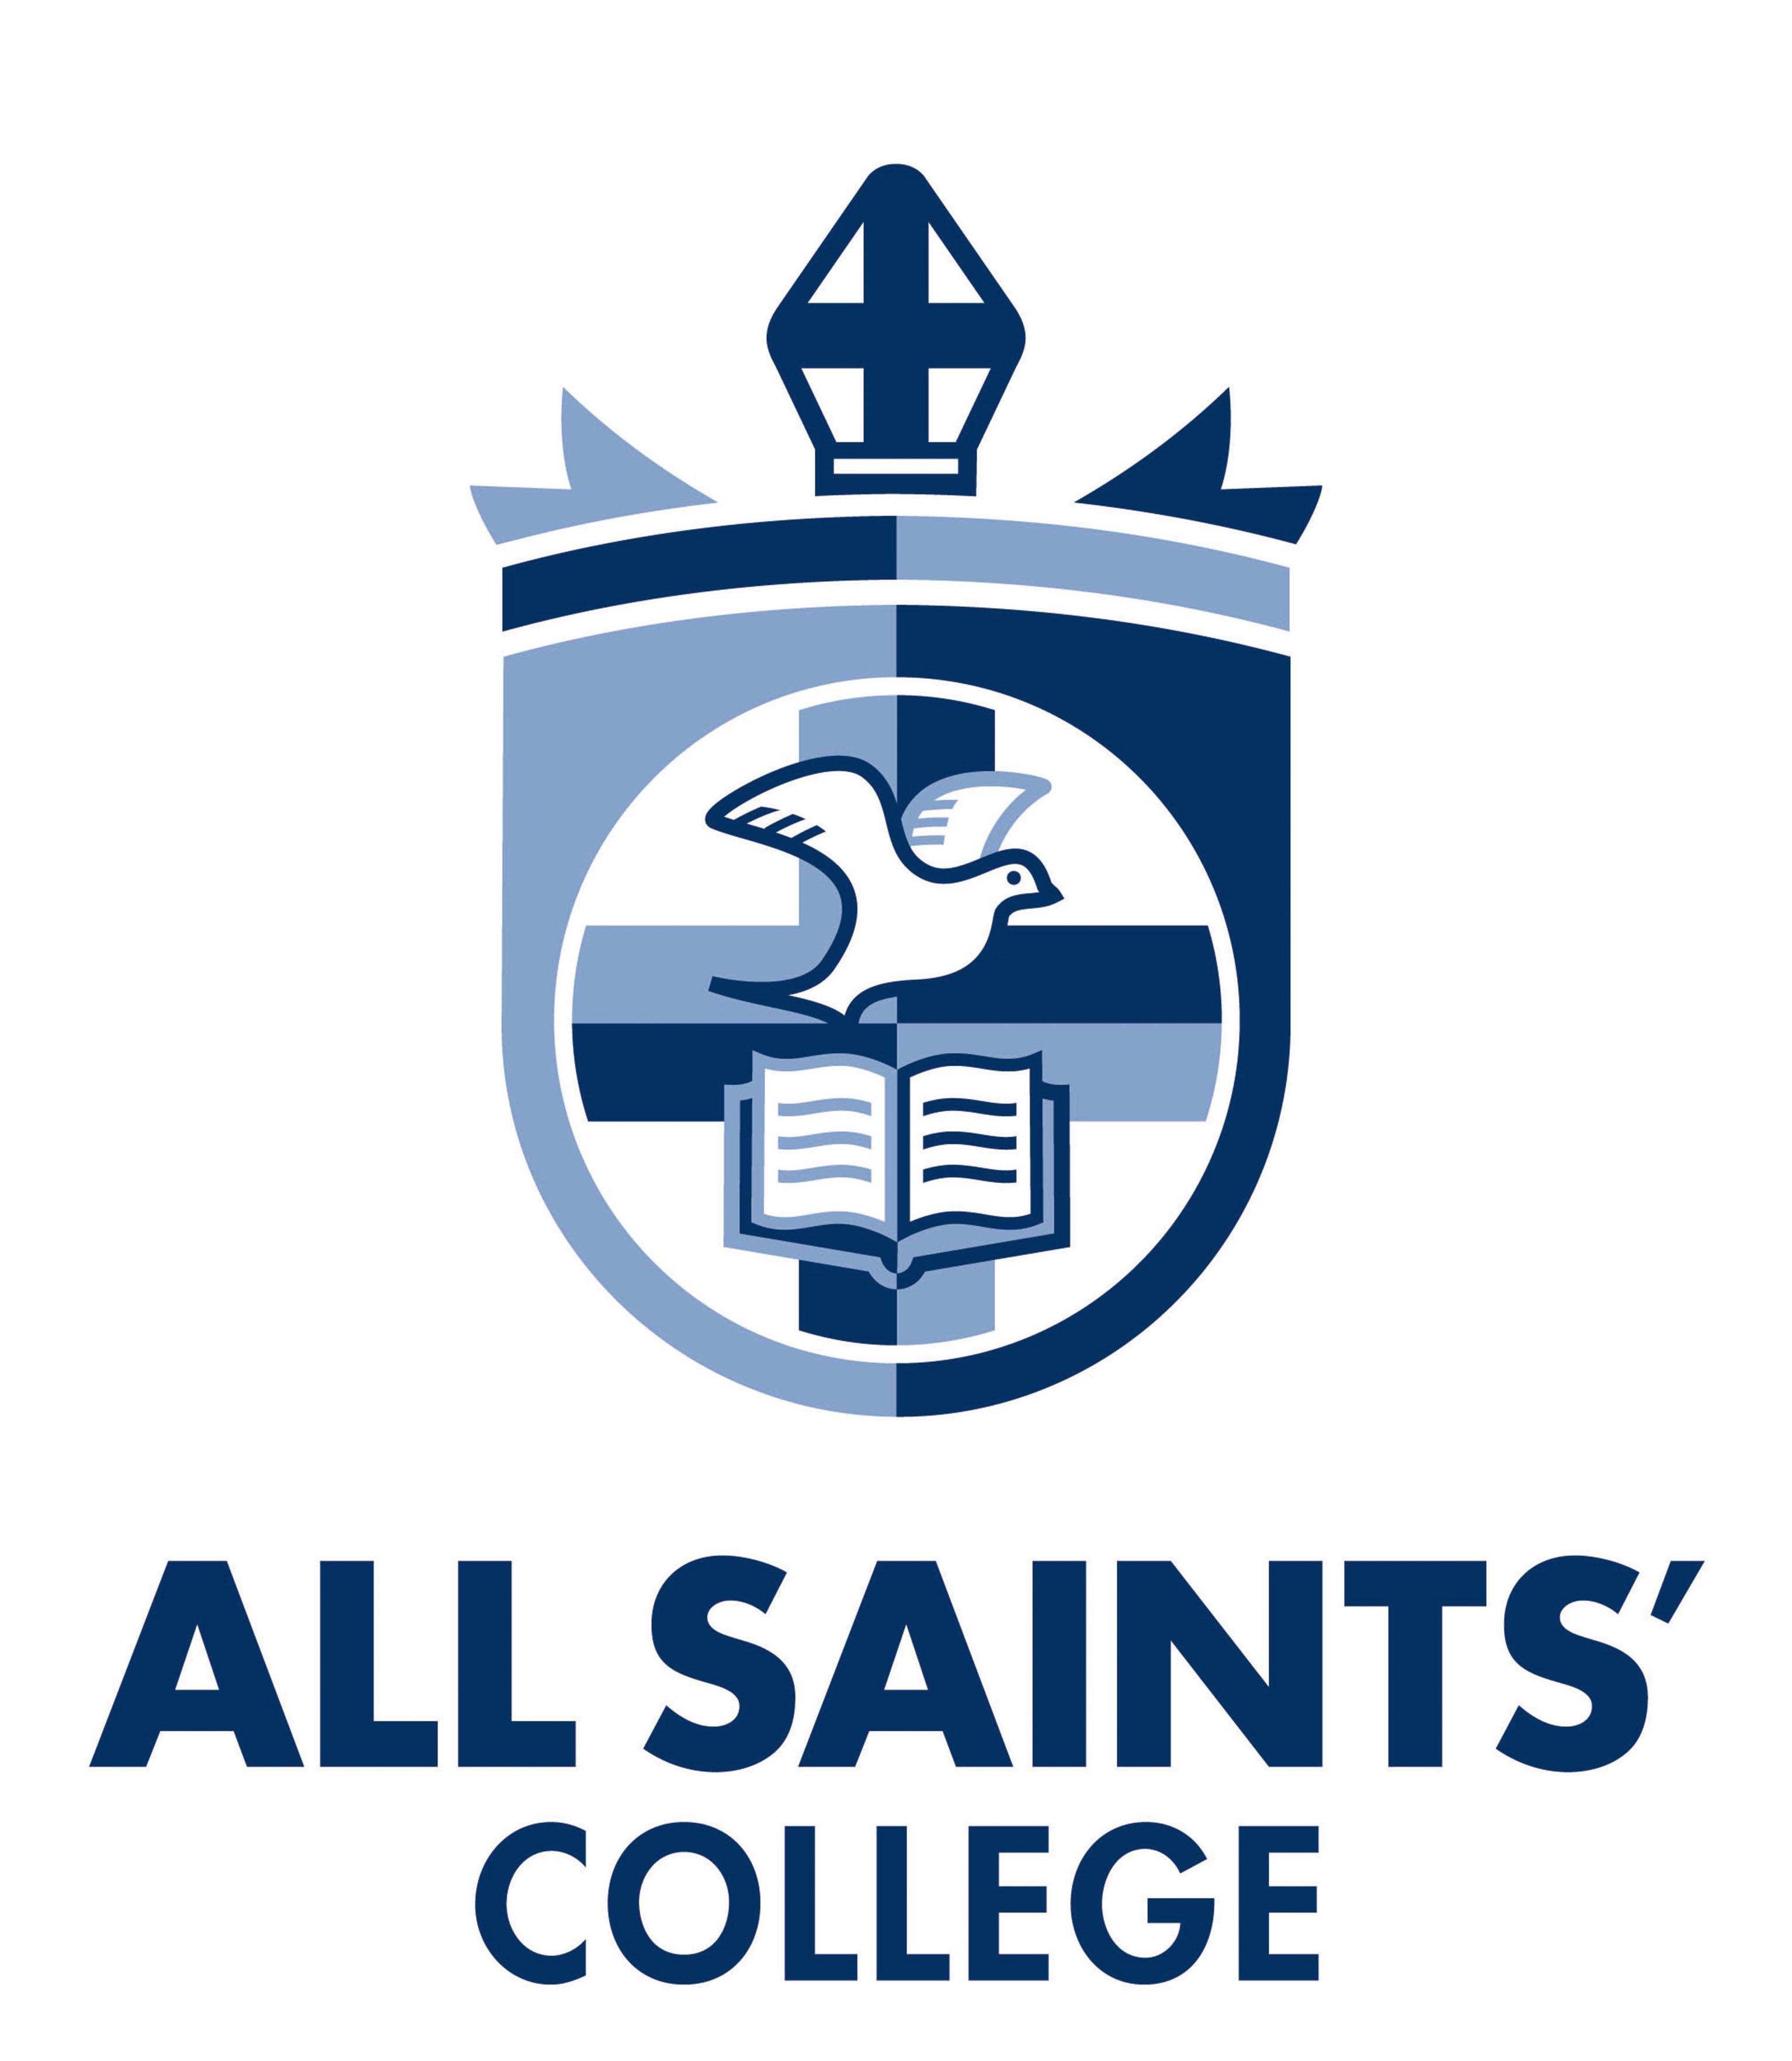 All Saints' College, Bull Creek, WA